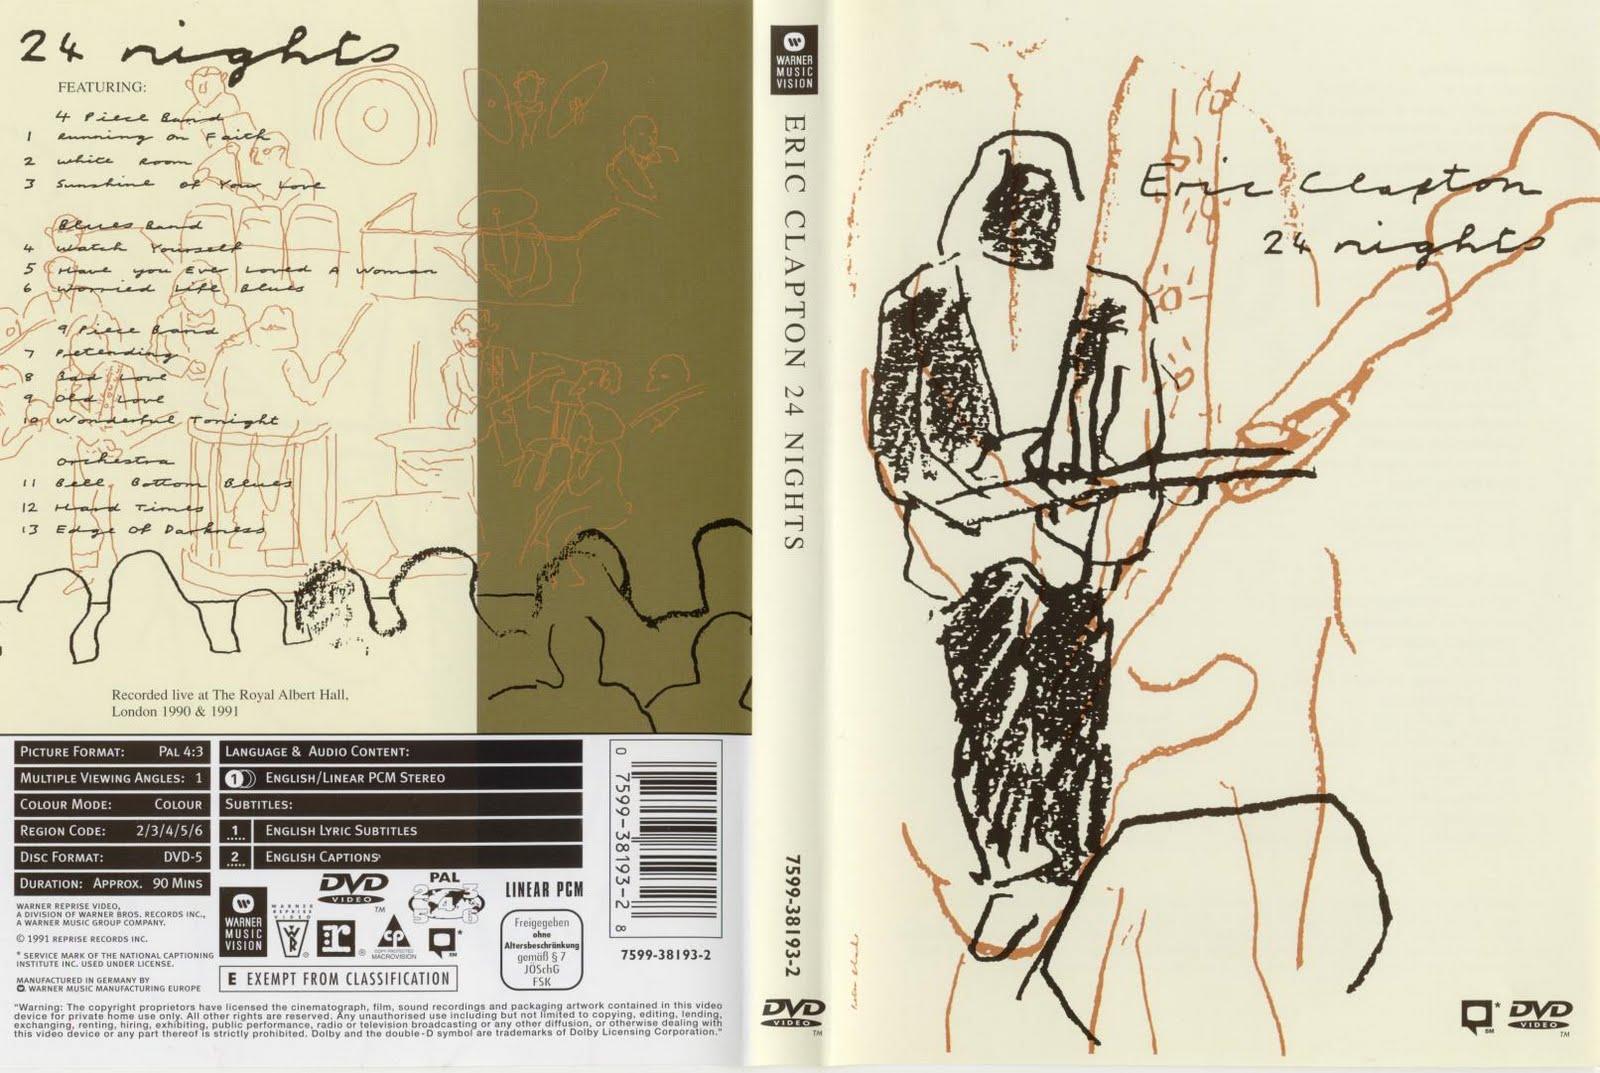 http://4.bp.blogspot.com/_se0zHB8H7oU/S_MToWnJTGI/AAAAAAAACfY/lX0tigpEKLM/s1600/Eric+Clapton+-+24+Nights+-+Cover.jpg